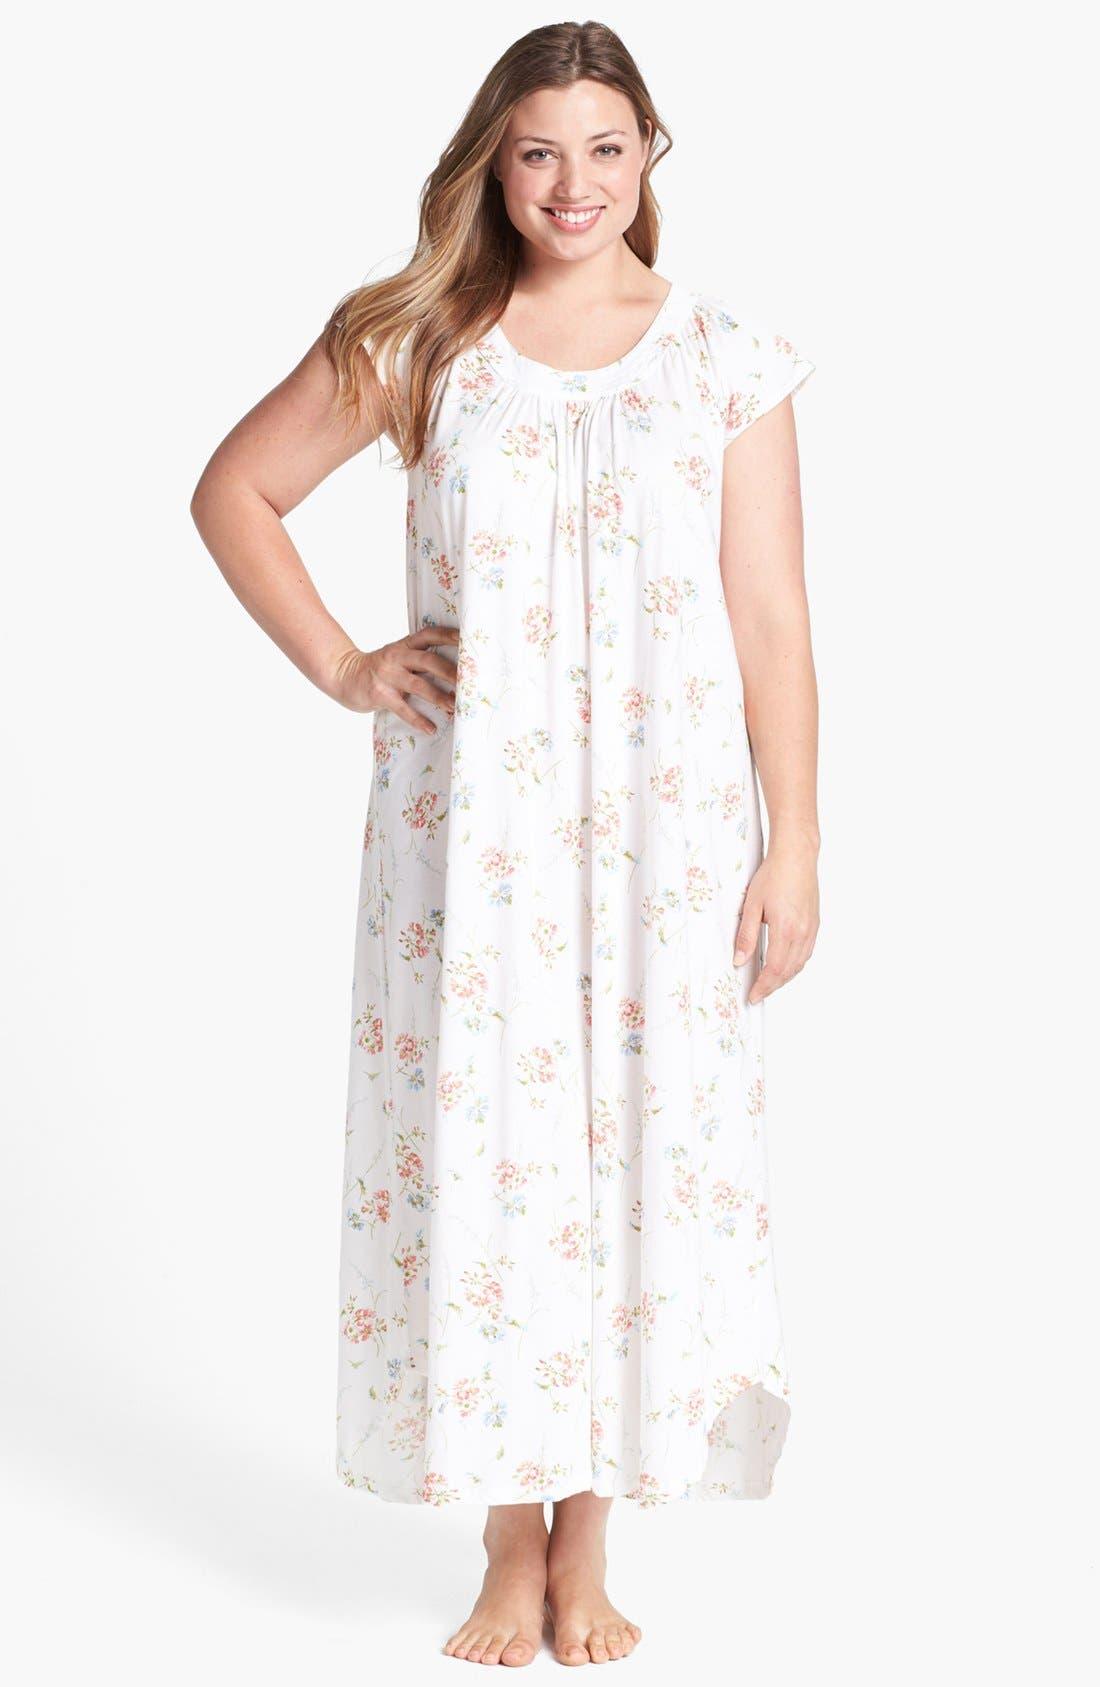 Main Image - Carole Hochman Designs 'Garden Delights' Nightgown (Plus Size)